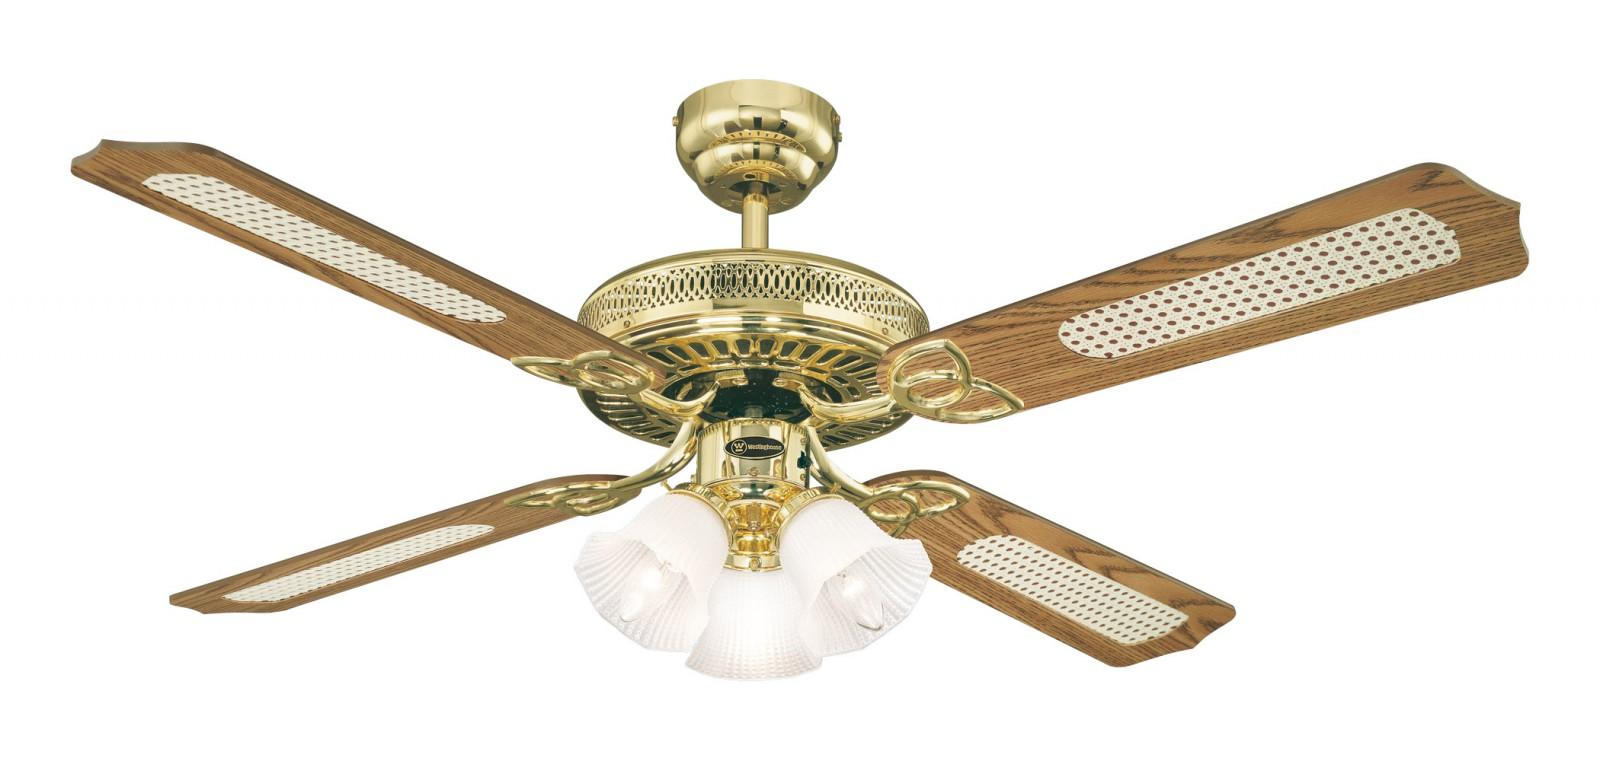 Ventilateur de plafond monarch trio de westinghouse avec - Ventilateur de plafond avec eclairage ...